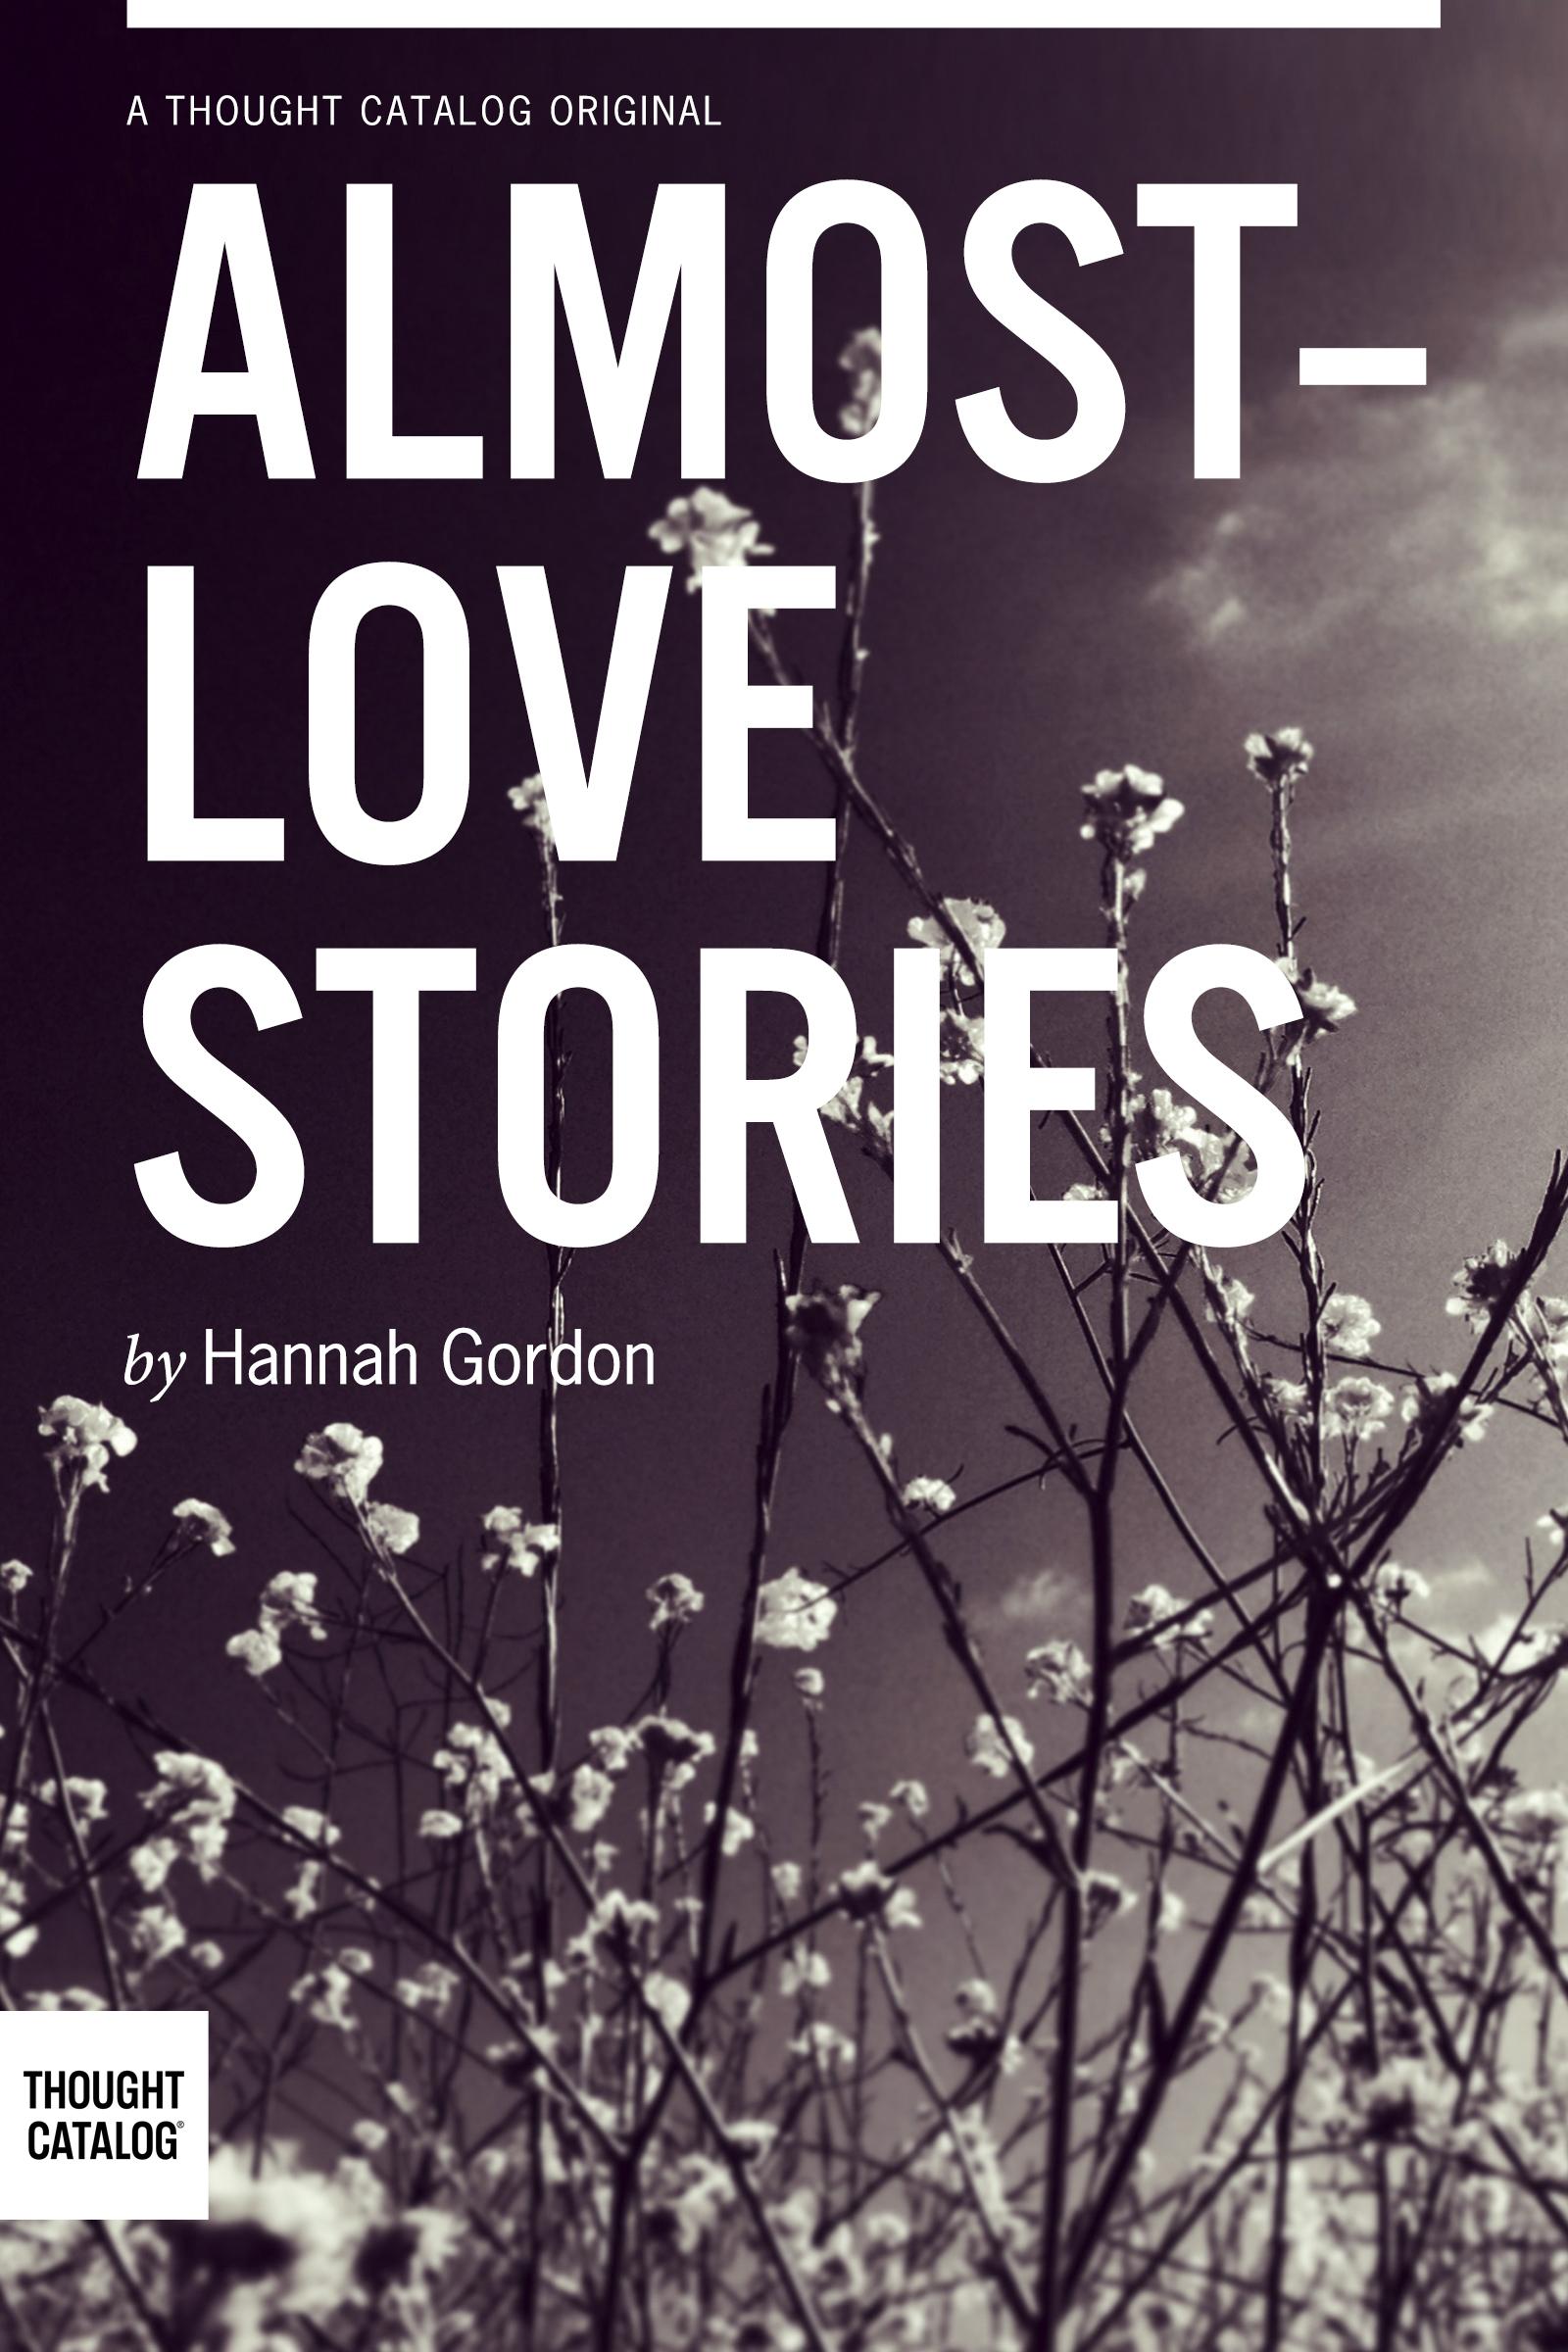 almostlovestories